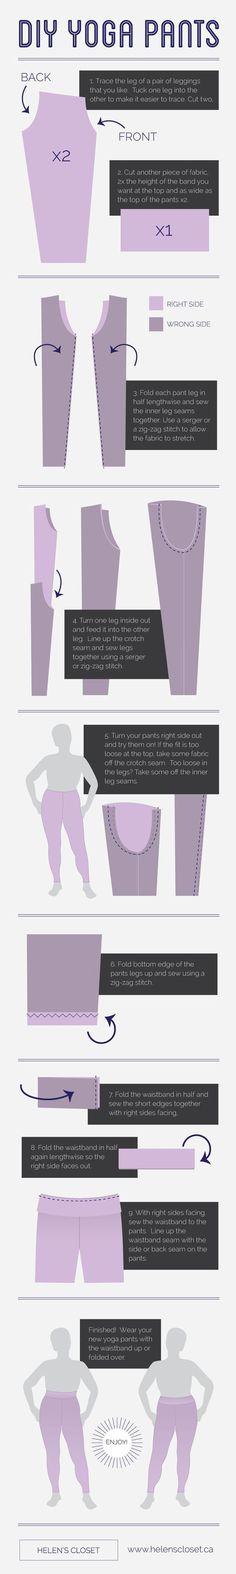 nice DIY Yoga Pants by Helen's Closet...